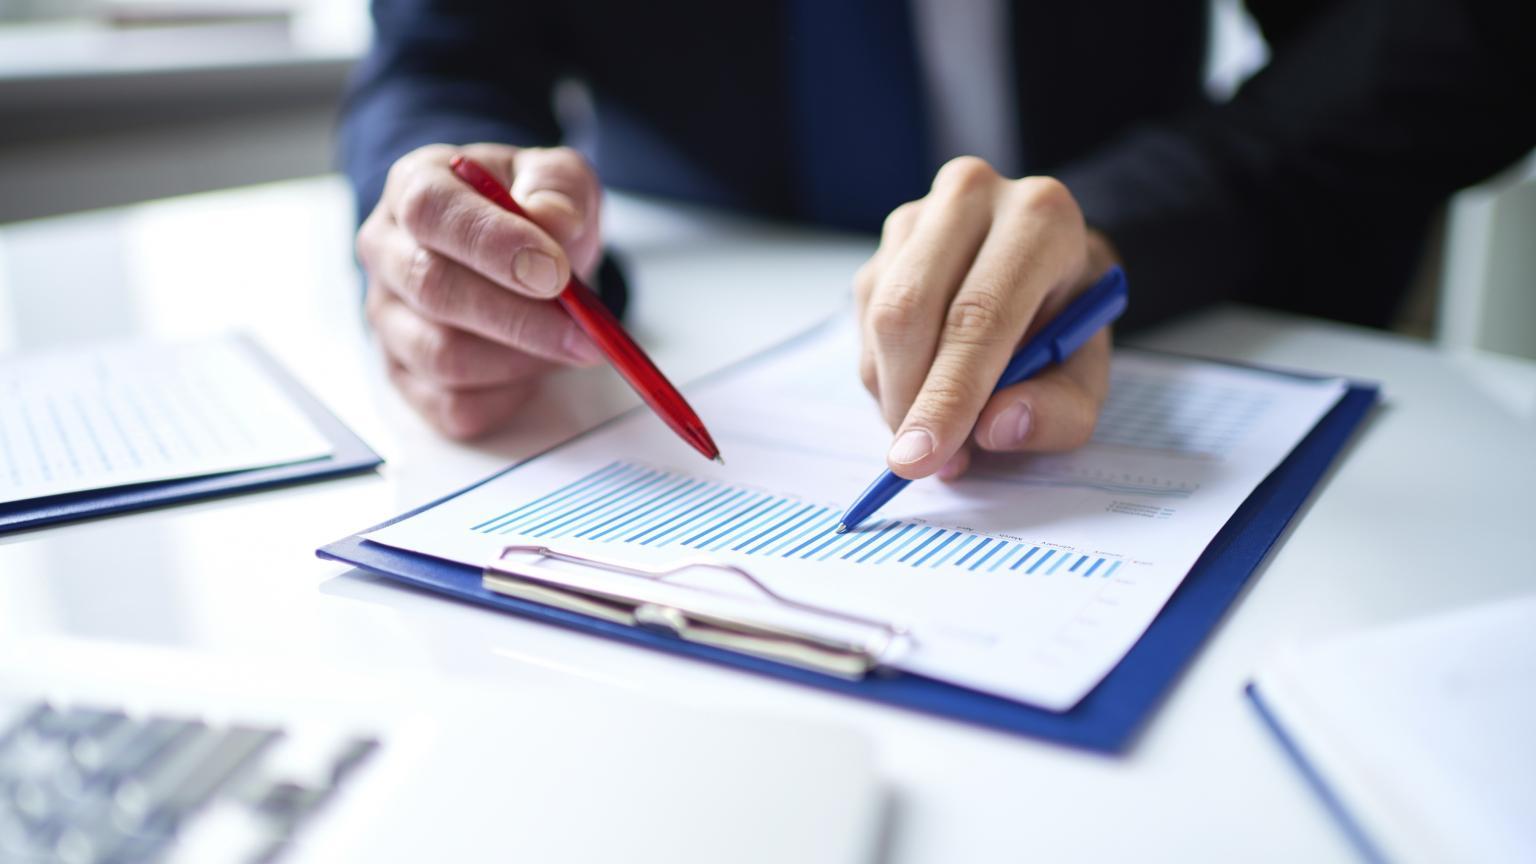 ESOS is a mandatory energy assessment and energy-saving identification scheme